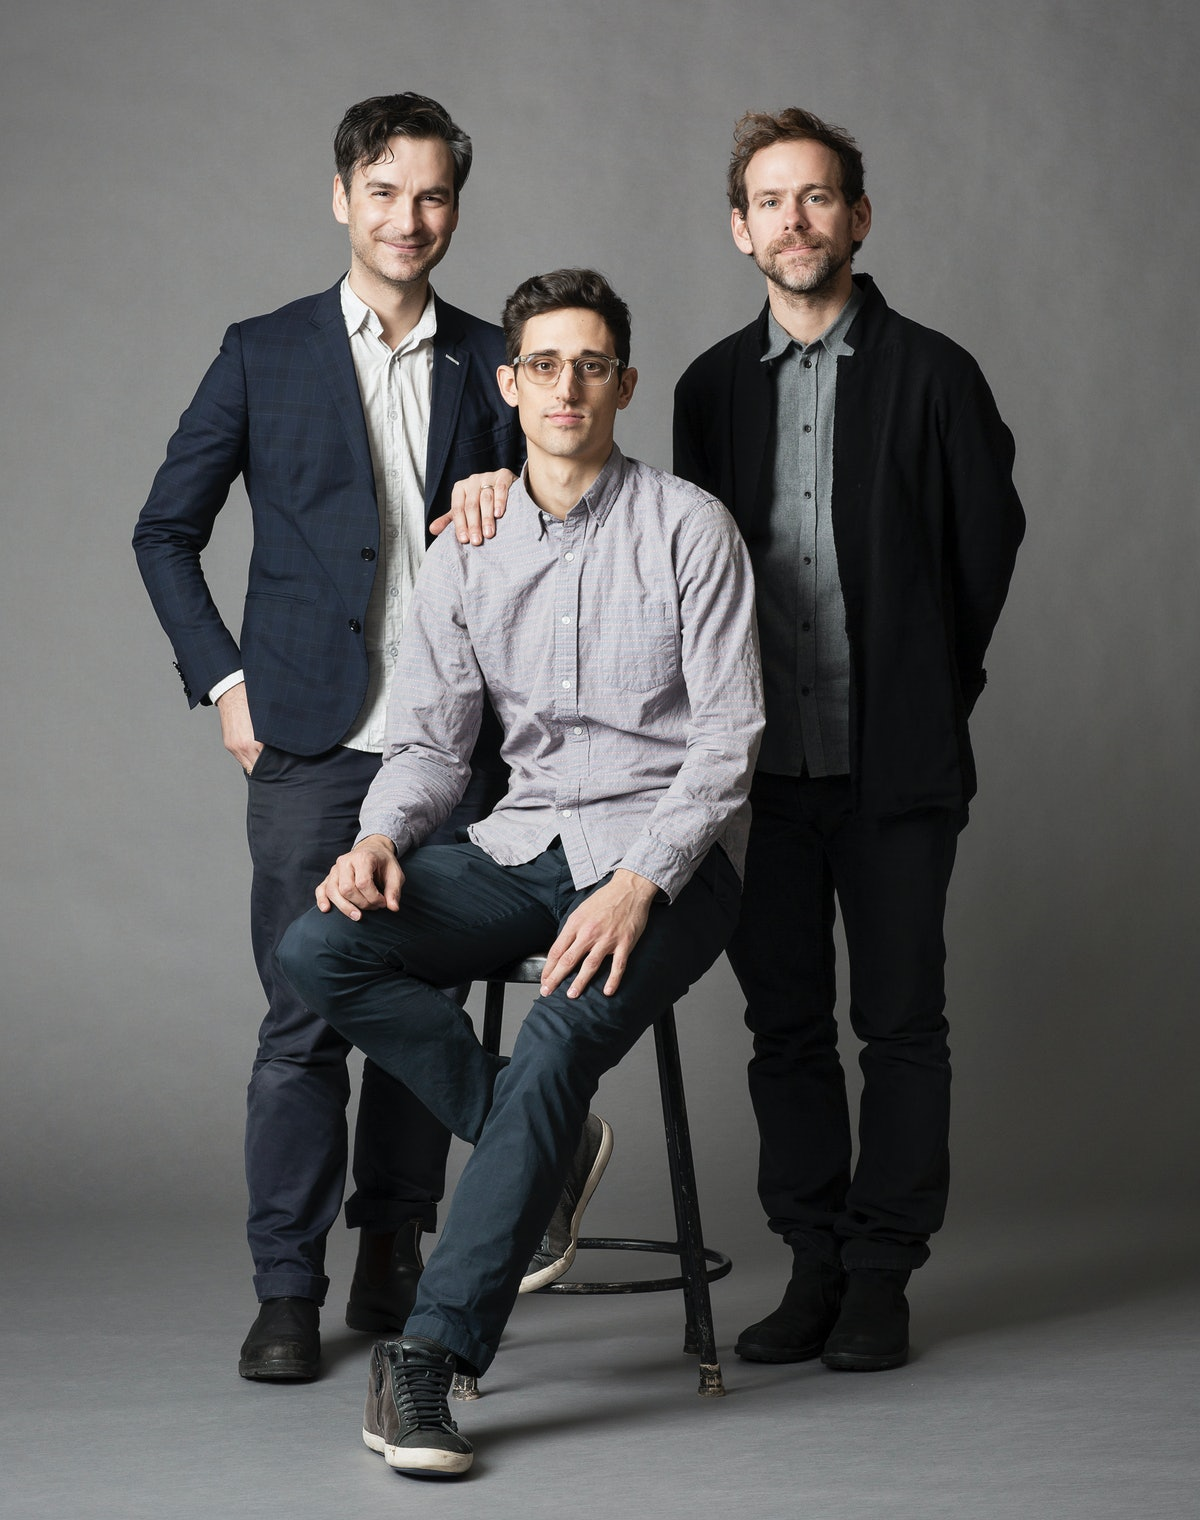 Marcel Dzama, Justin Peck, and Bryce Dessner